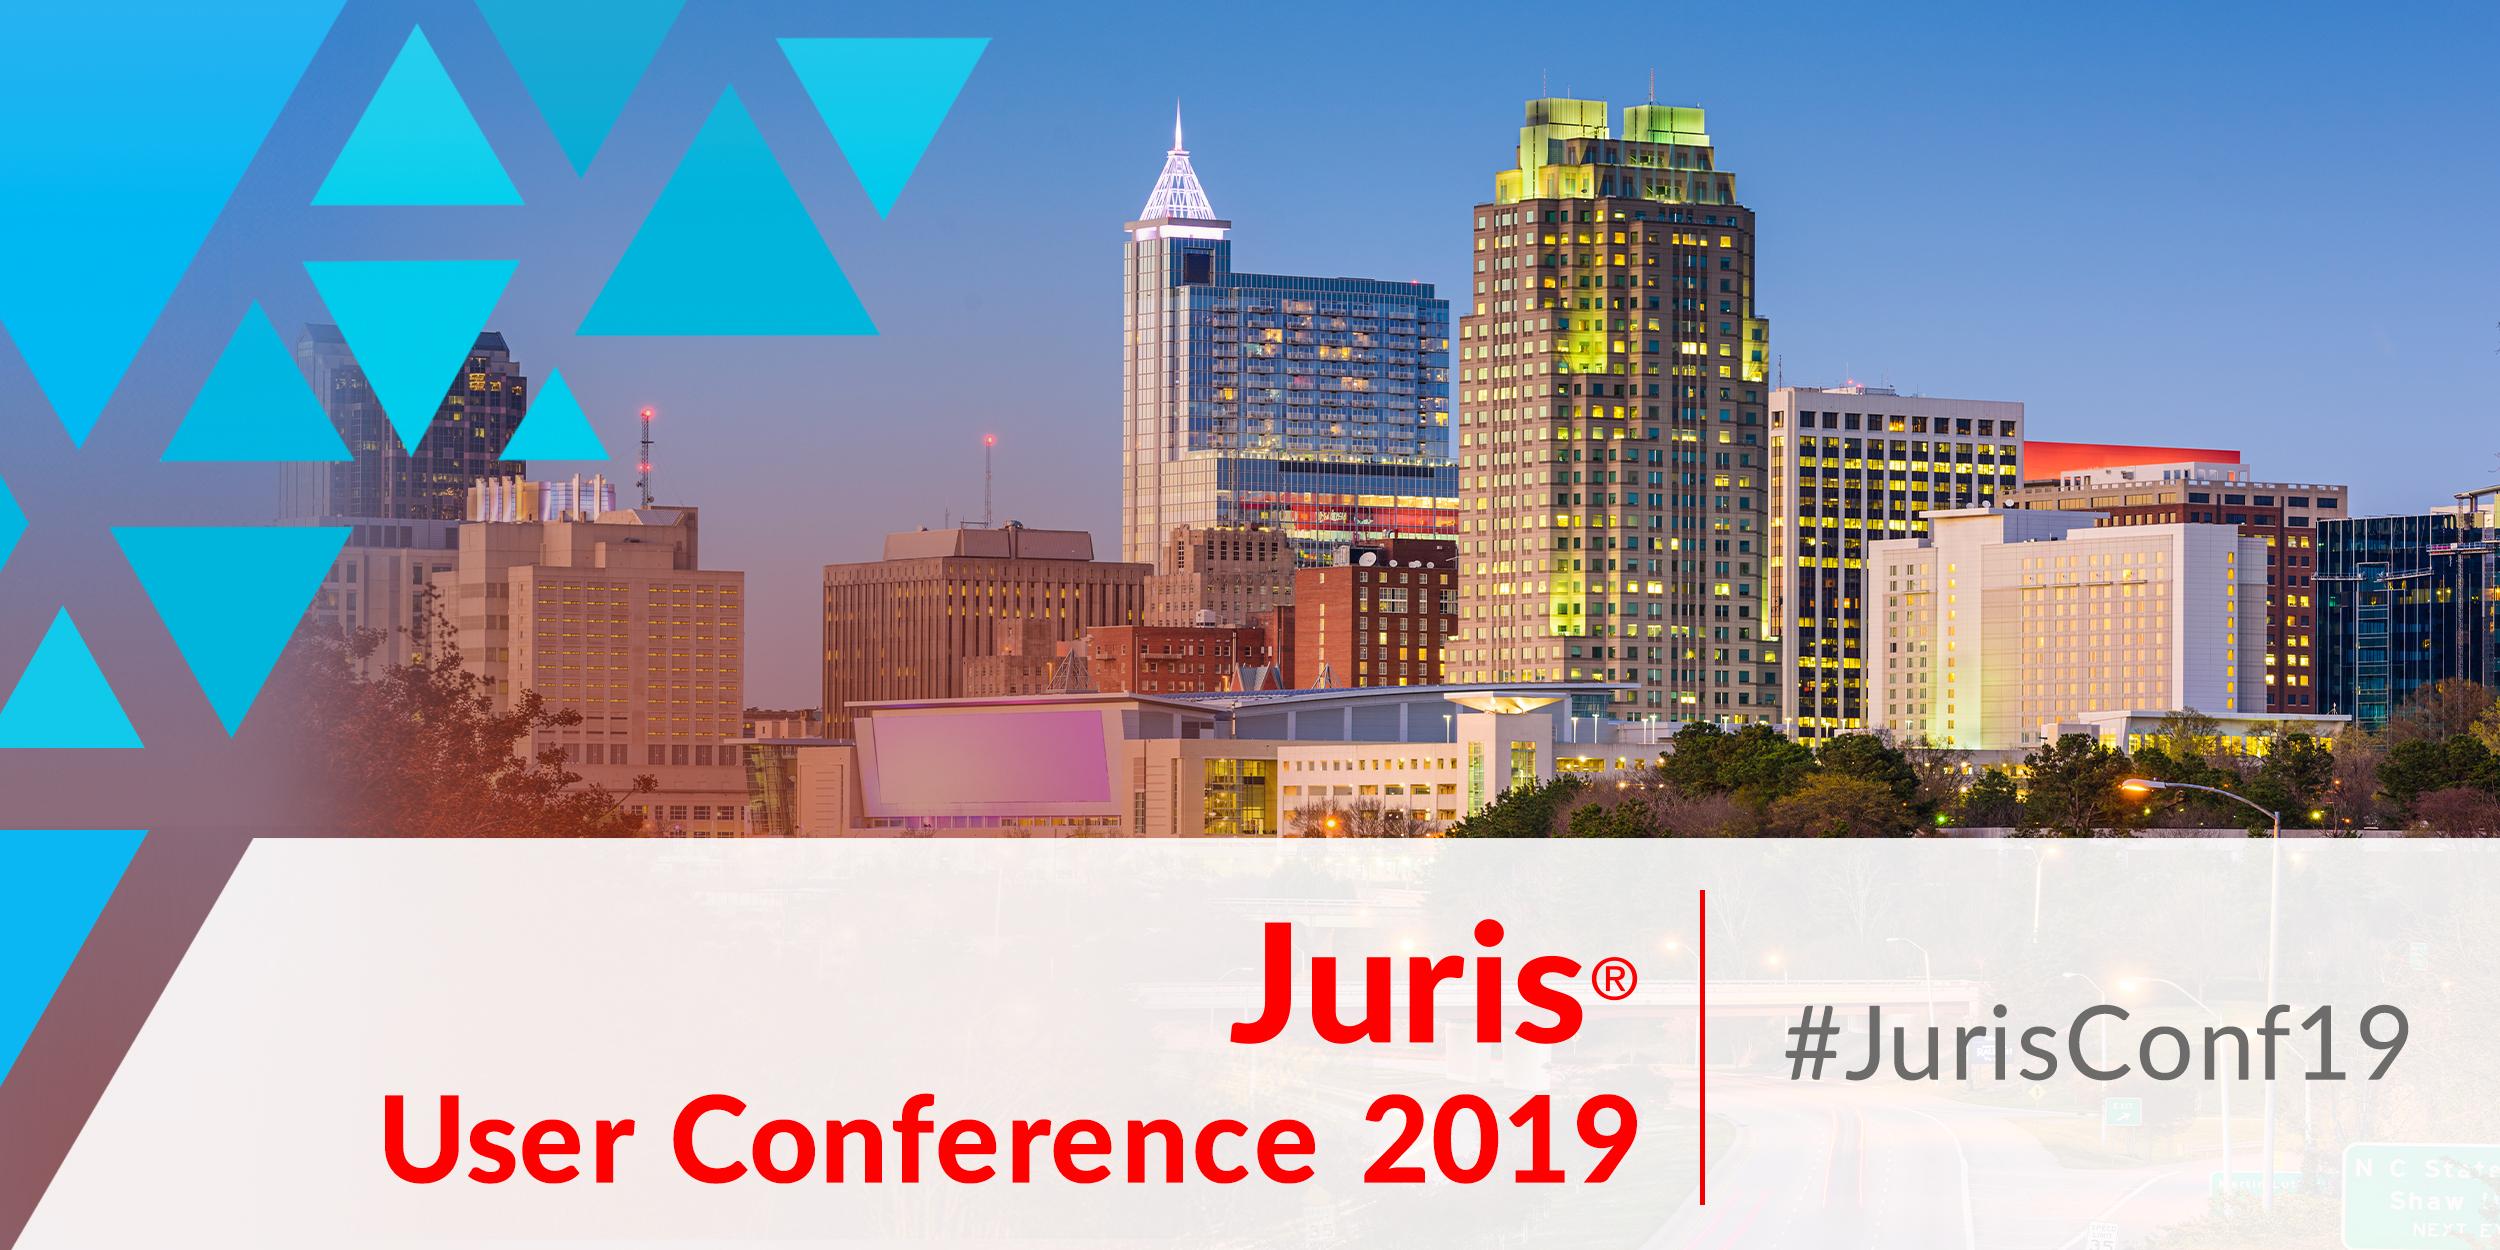 001450_Juris_User_Conference_2019_Web_header_postevent_2500x1250